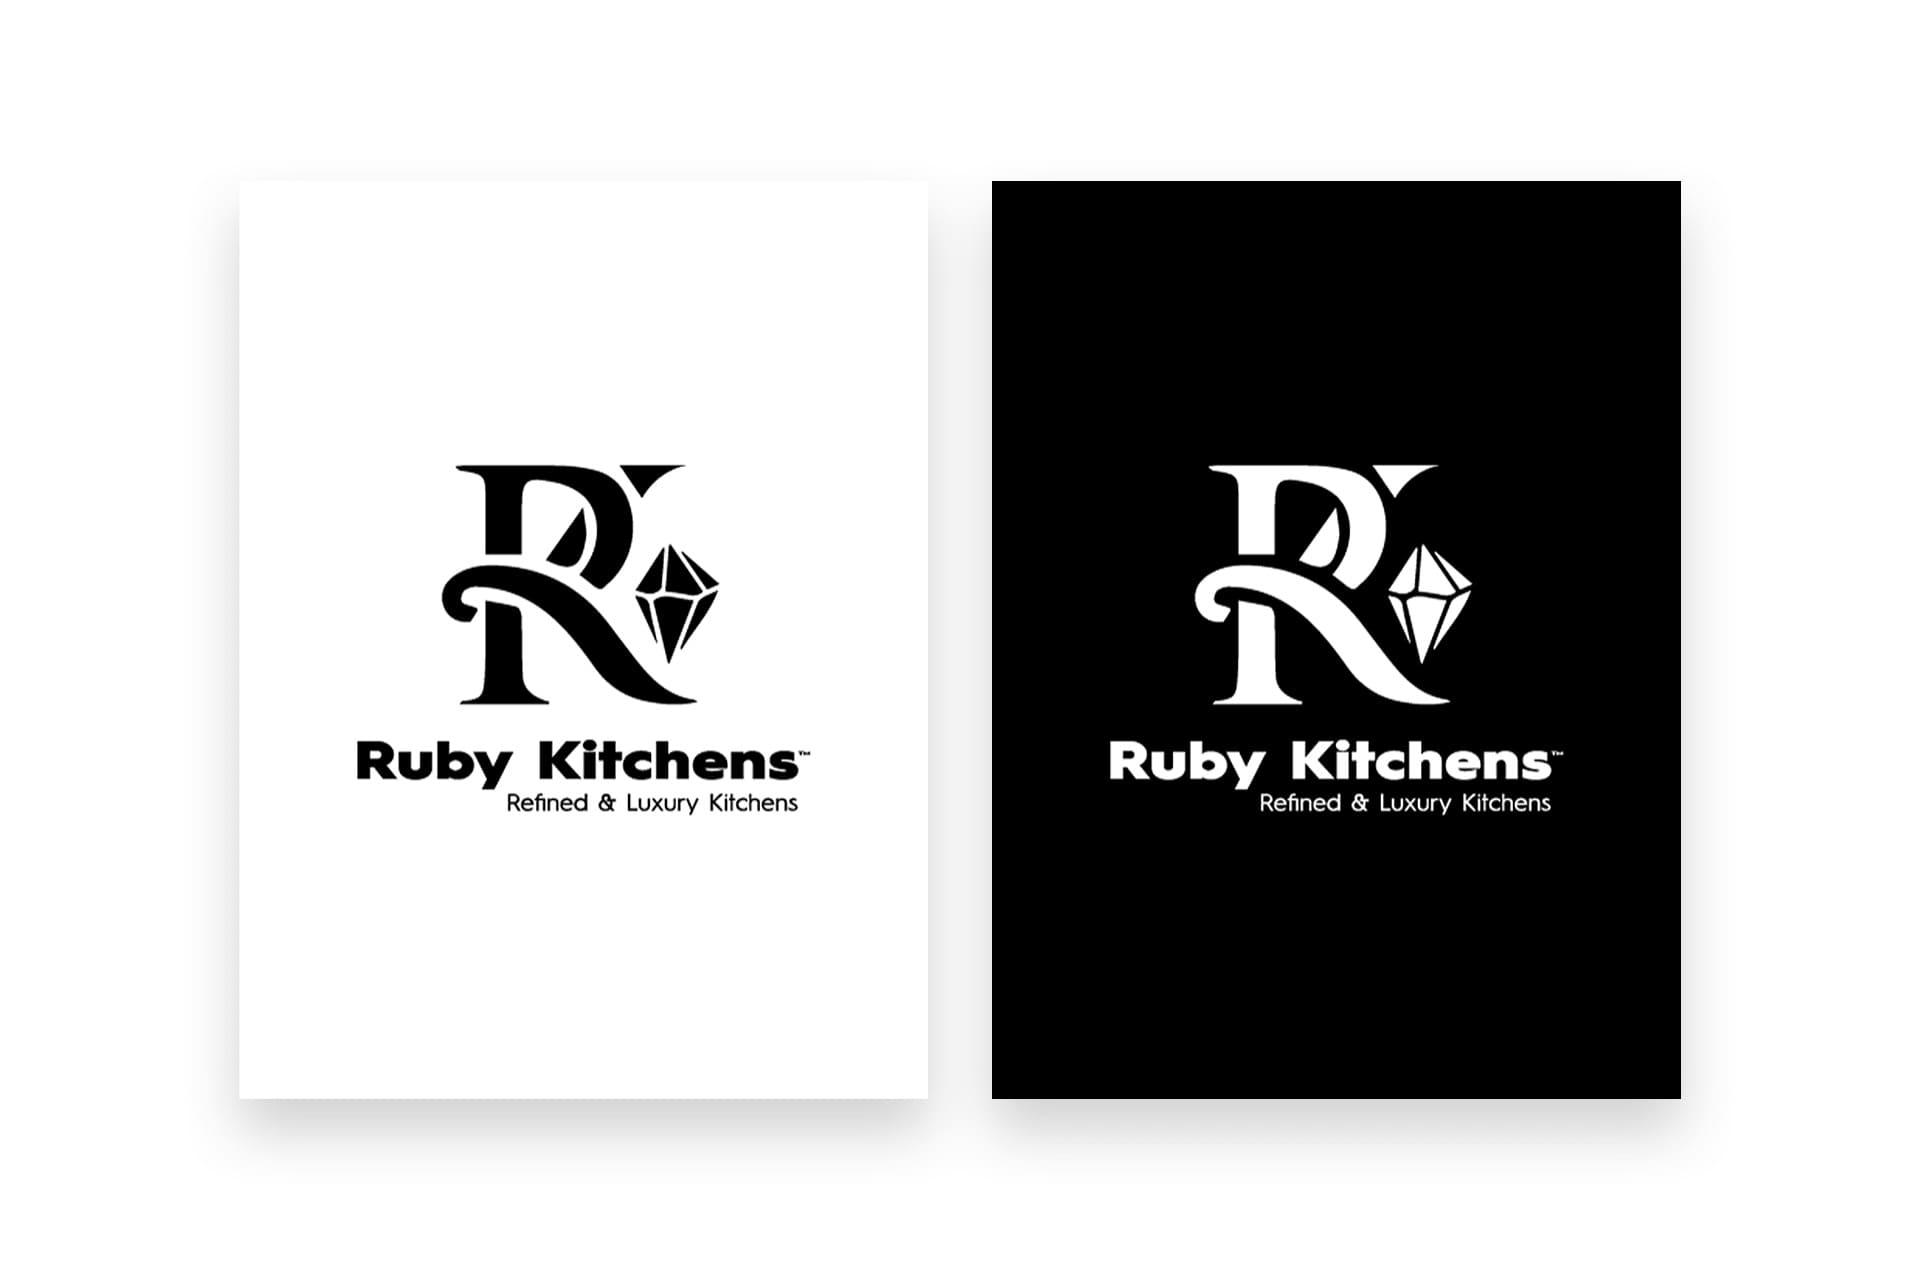 Ruby Kitchens Logo Design - B&W - The Logo Creative